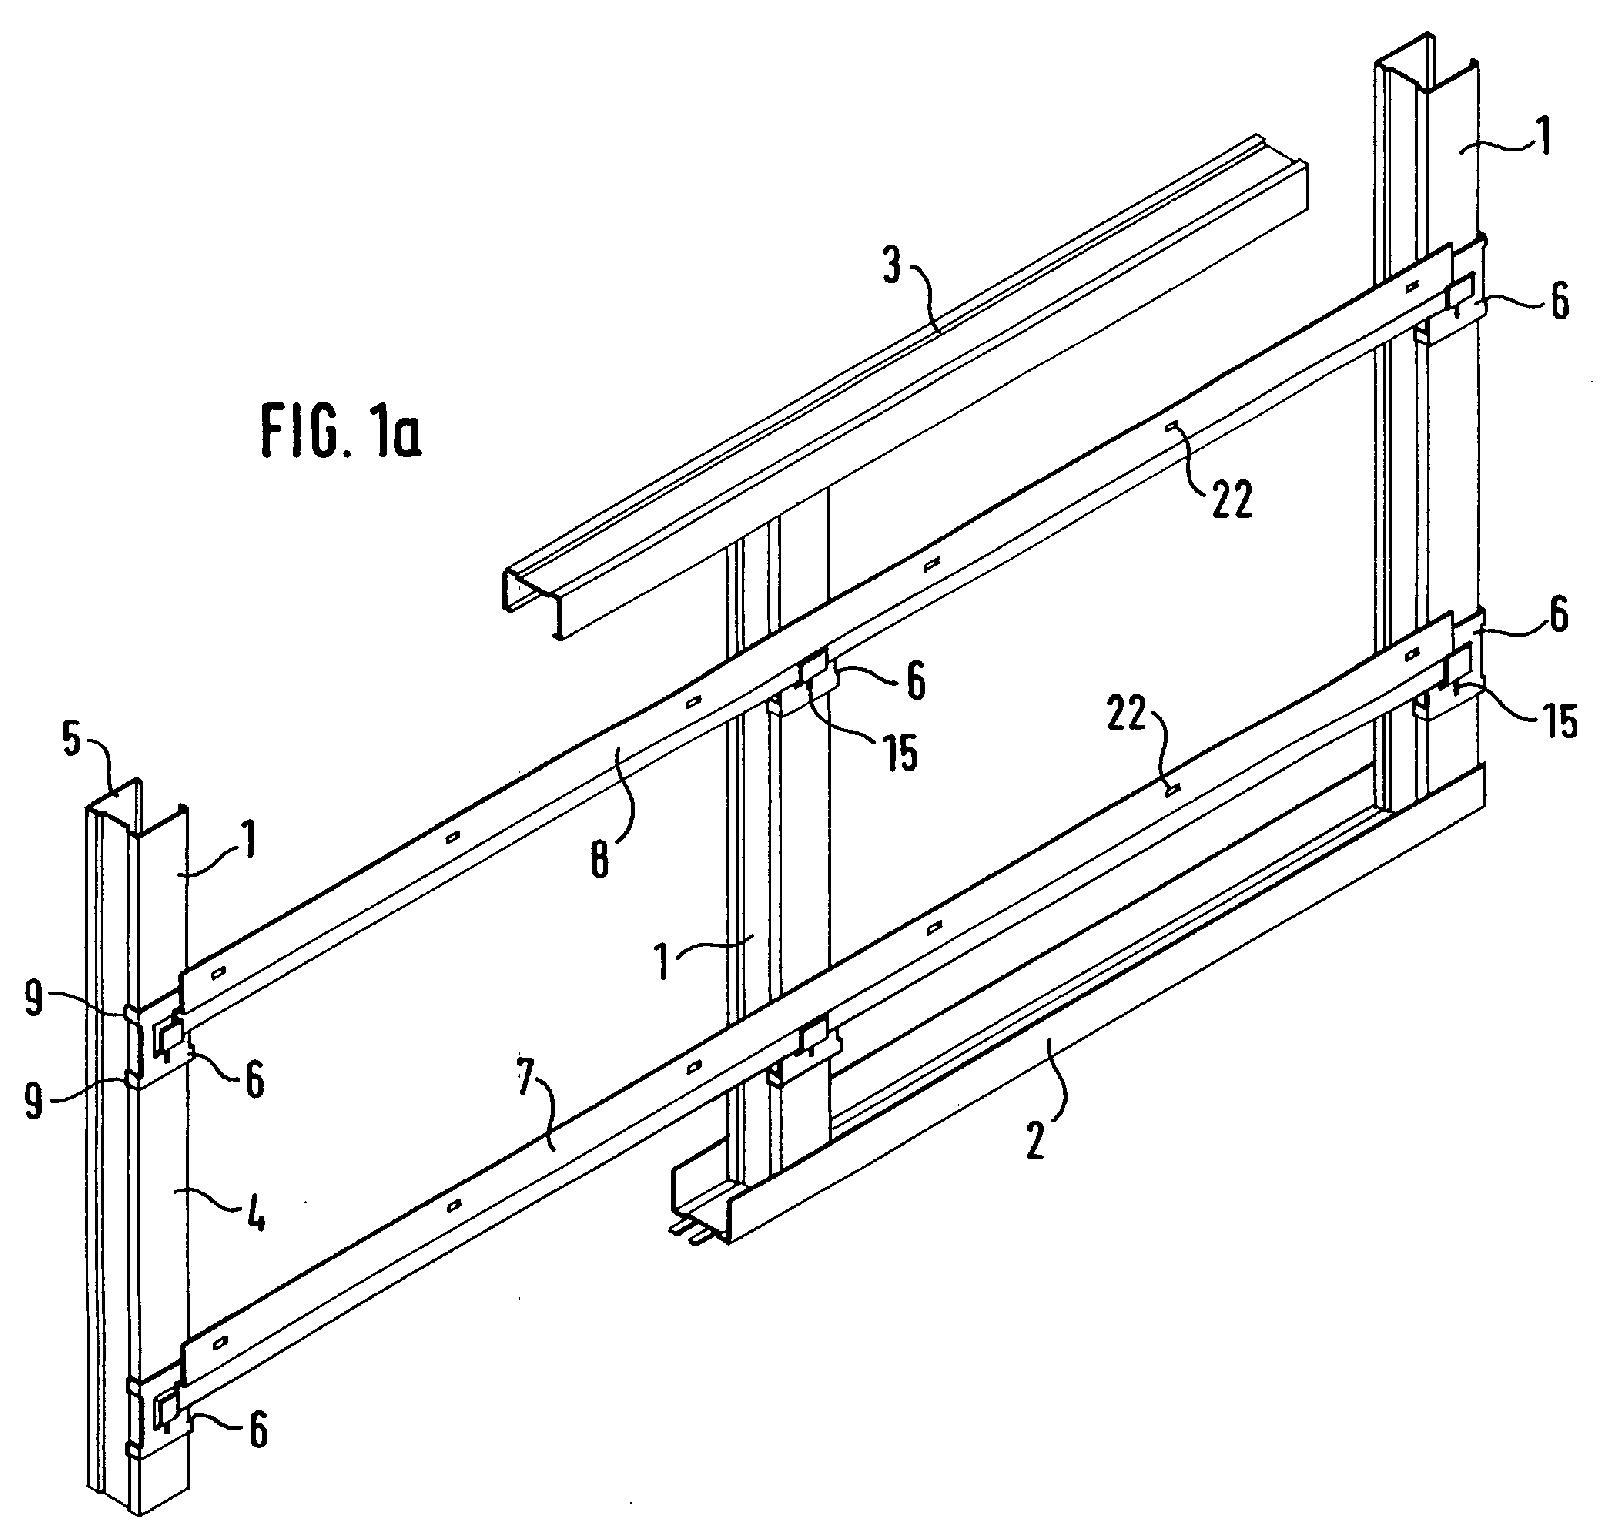 patent ep1321596a1 plattenmontagesystem zum erstellen. Black Bedroom Furniture Sets. Home Design Ideas